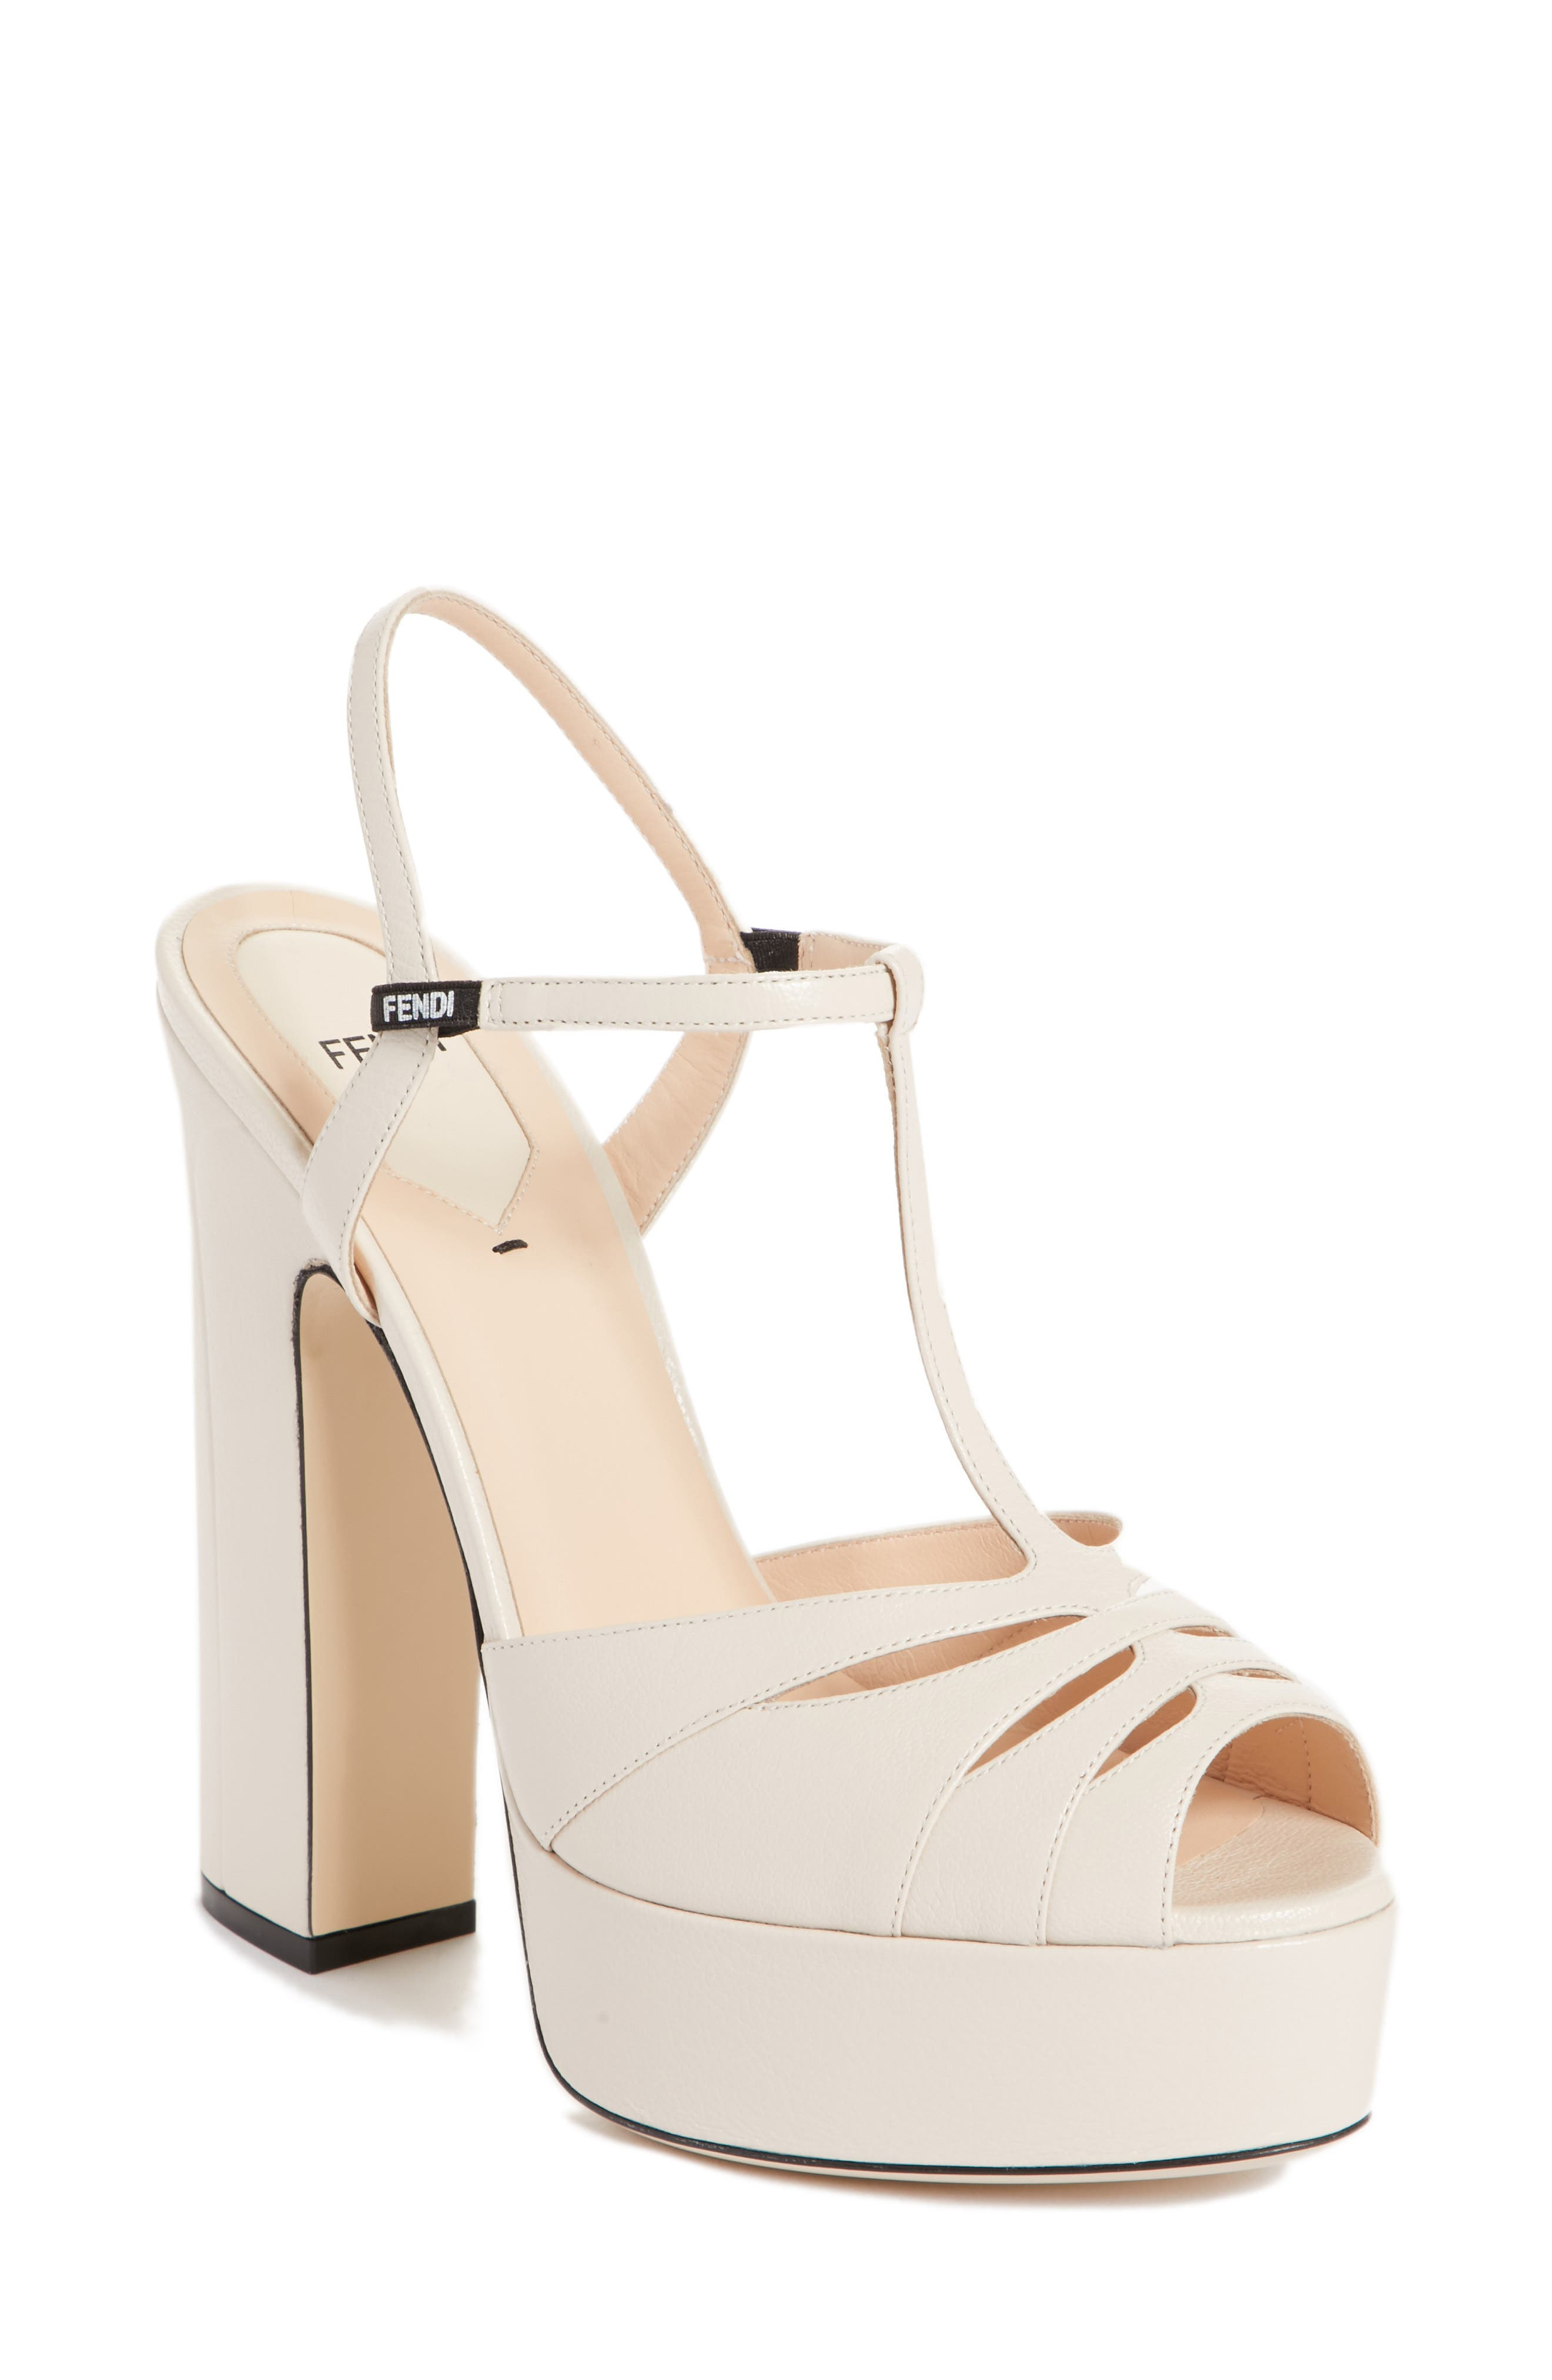 Duo Platform Sandal,                             Main thumbnail 1, color,                             Nude